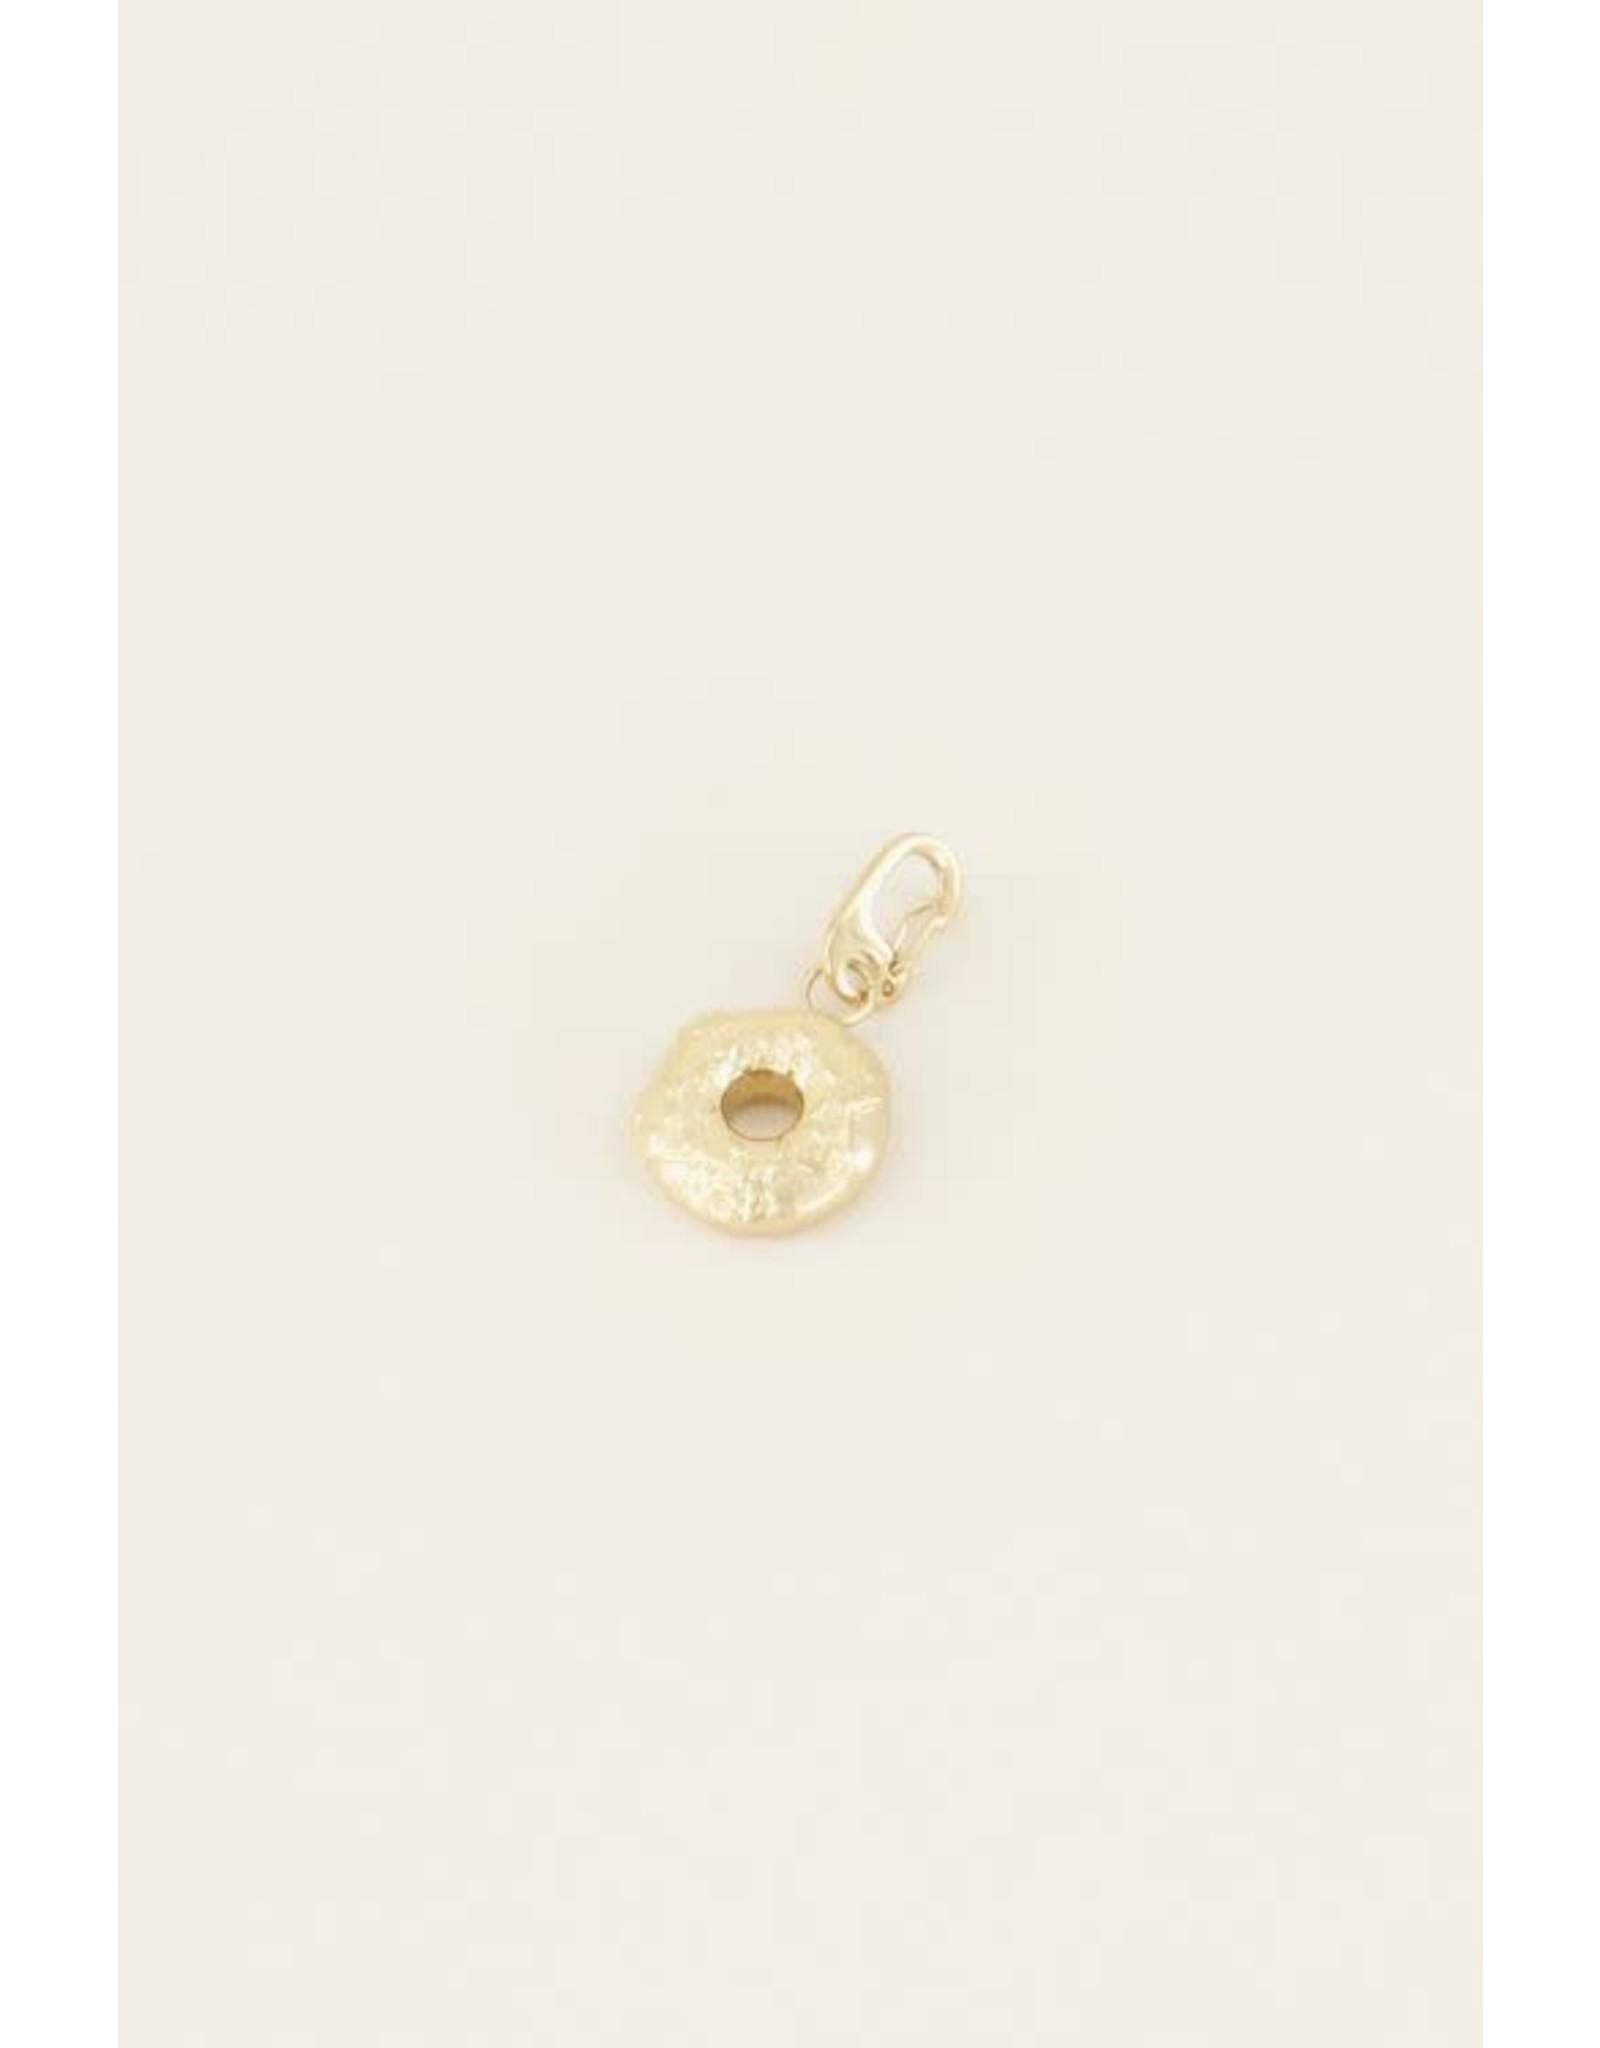 My Jewellery My Jewellery moments bedel donut